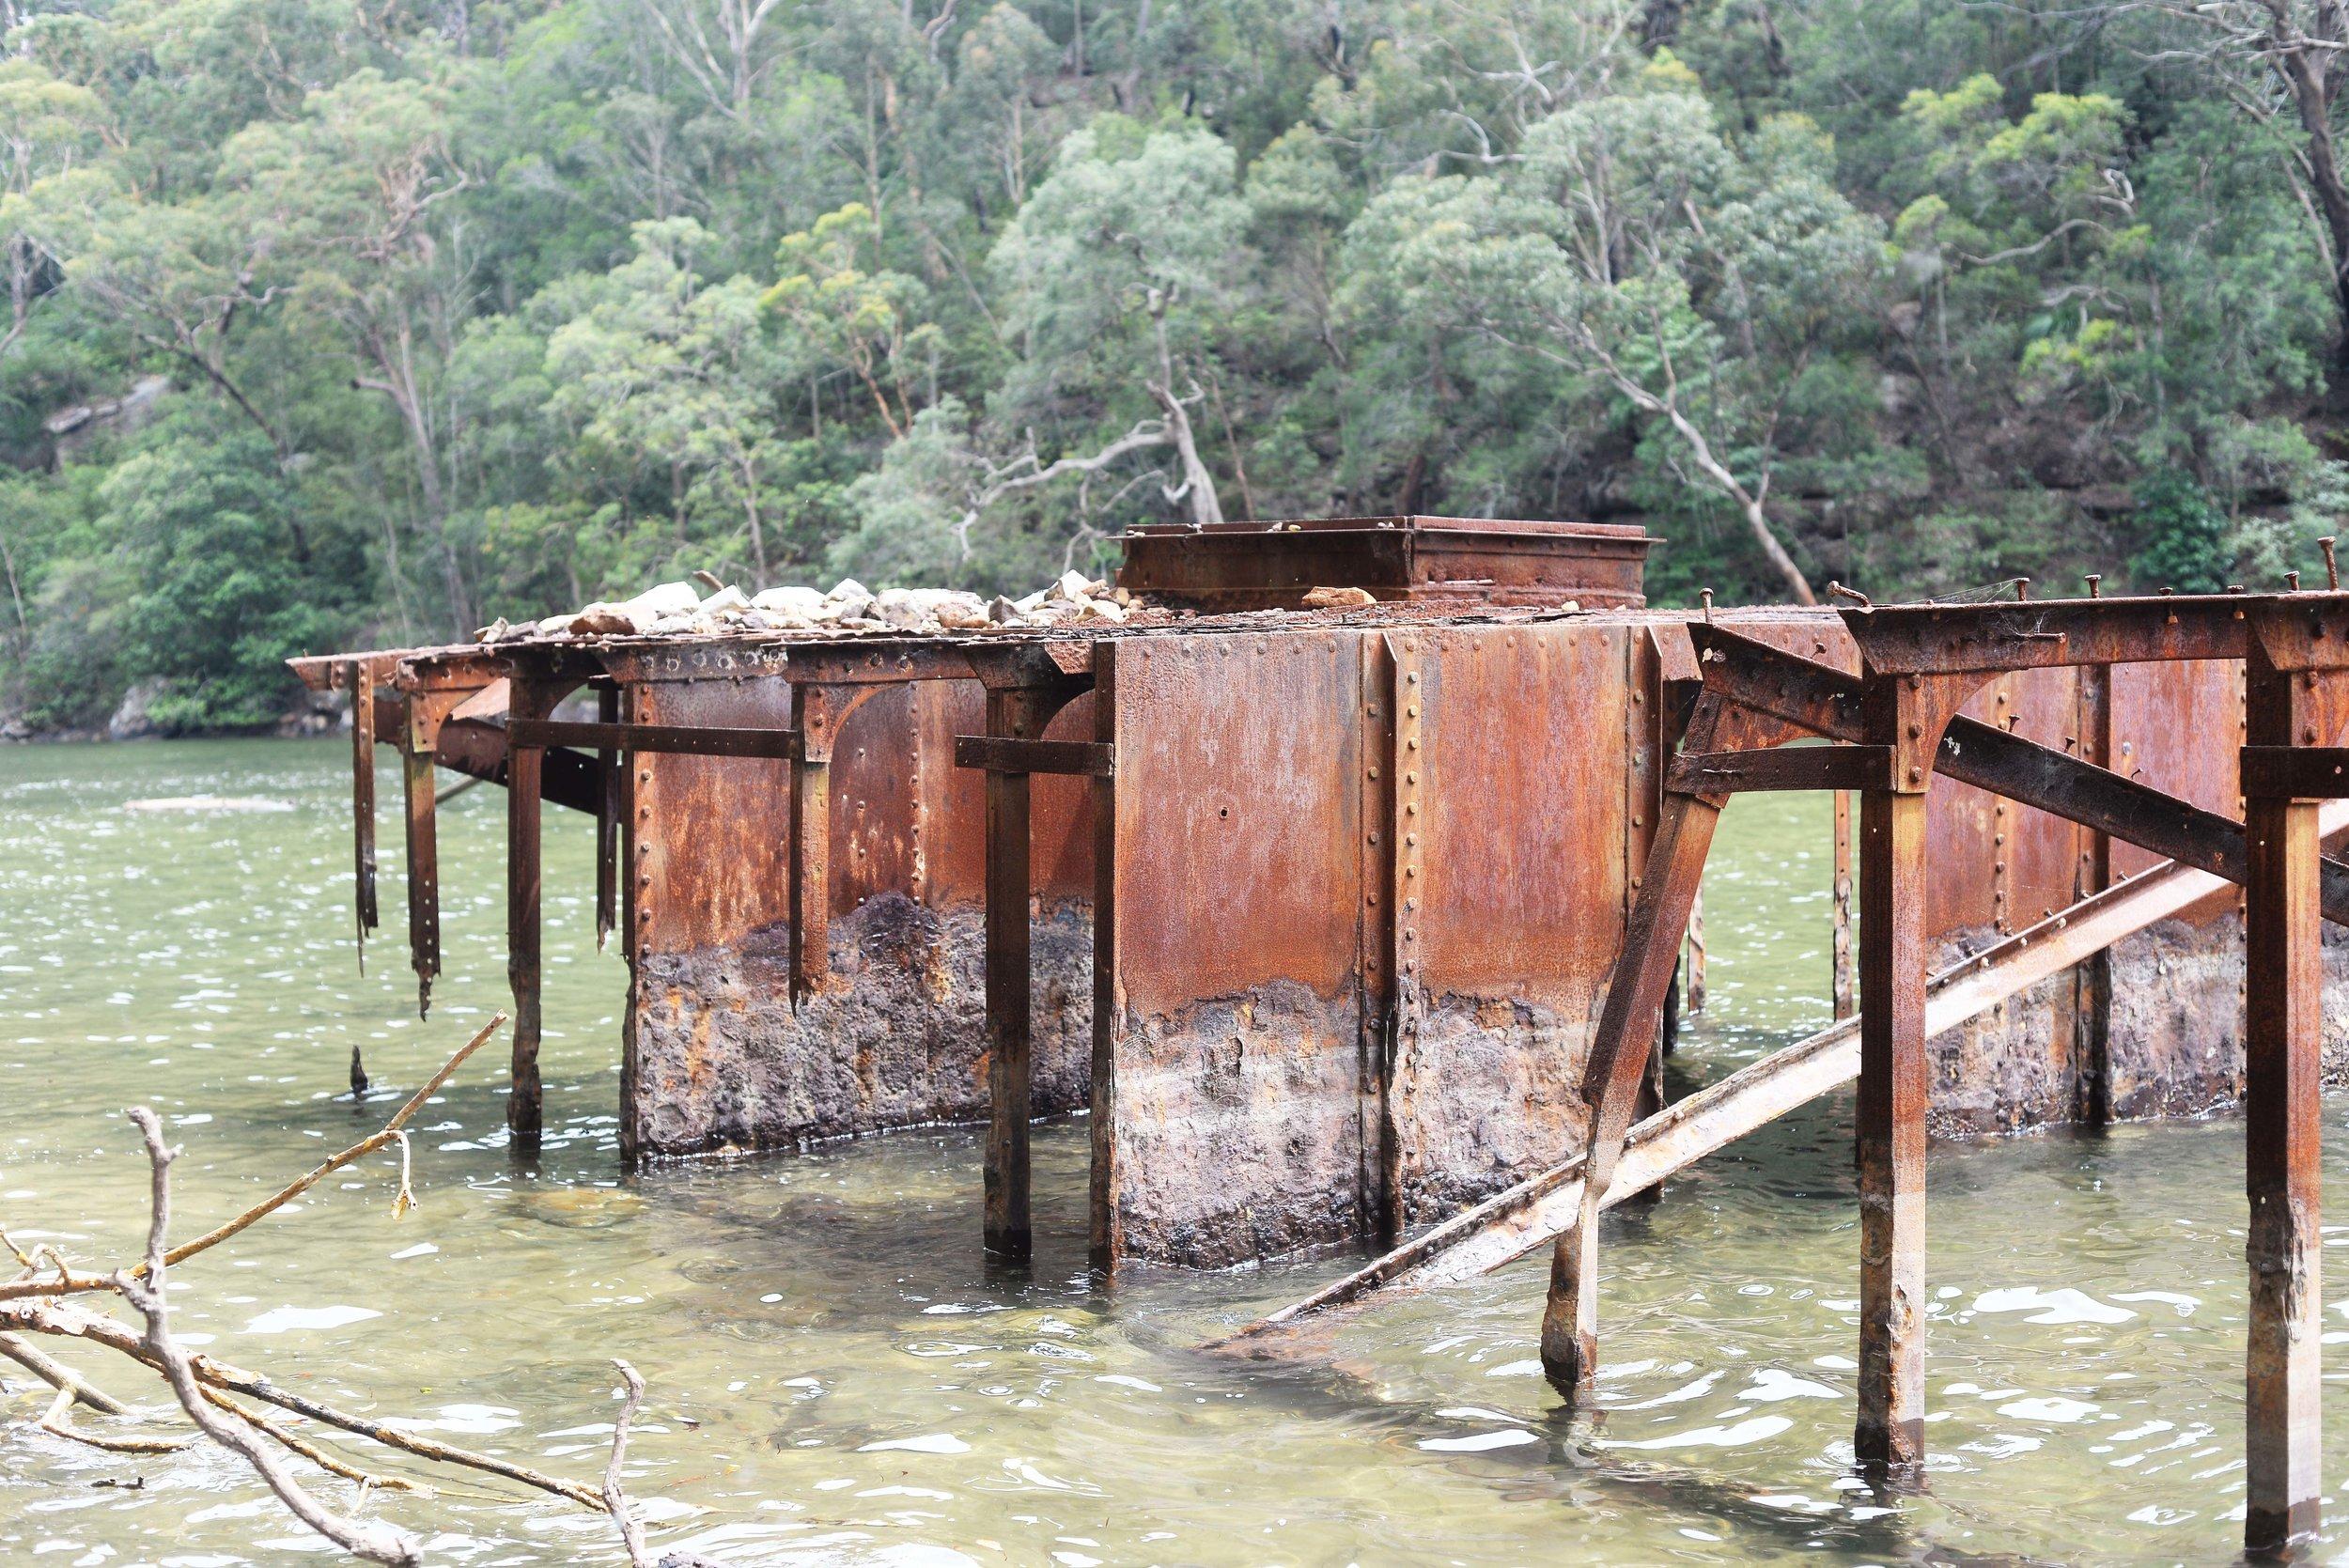 metal ruin kuringgai chase national park